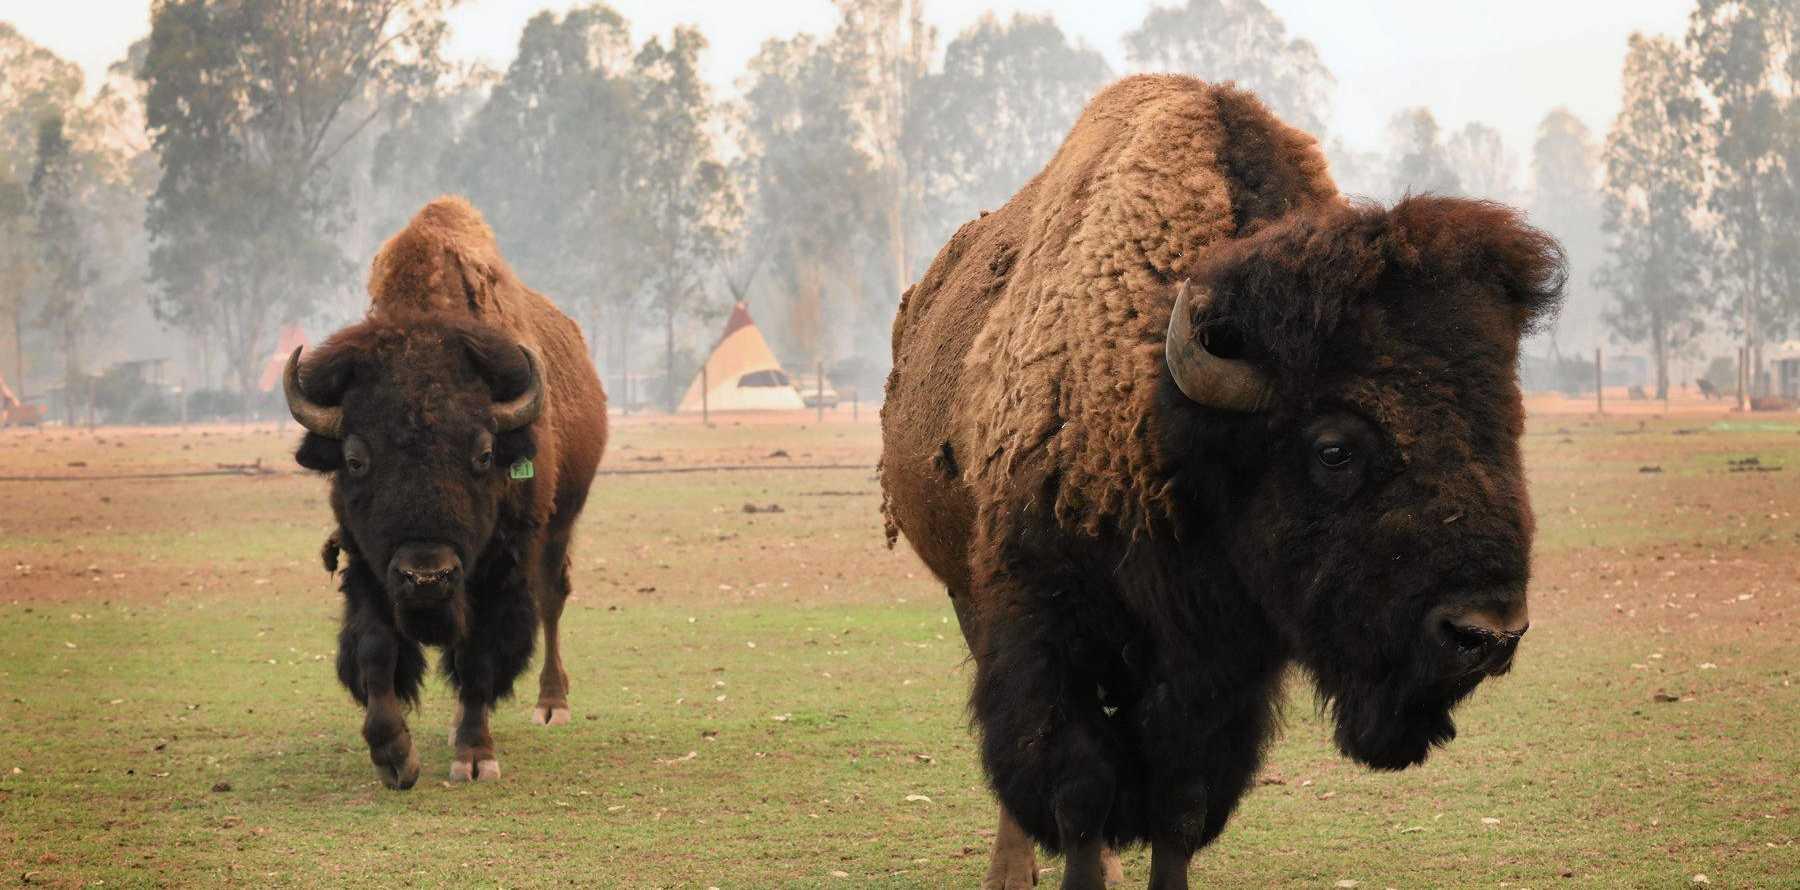 Bison are safe at Aranyani Bison Adventure Tourist Park.